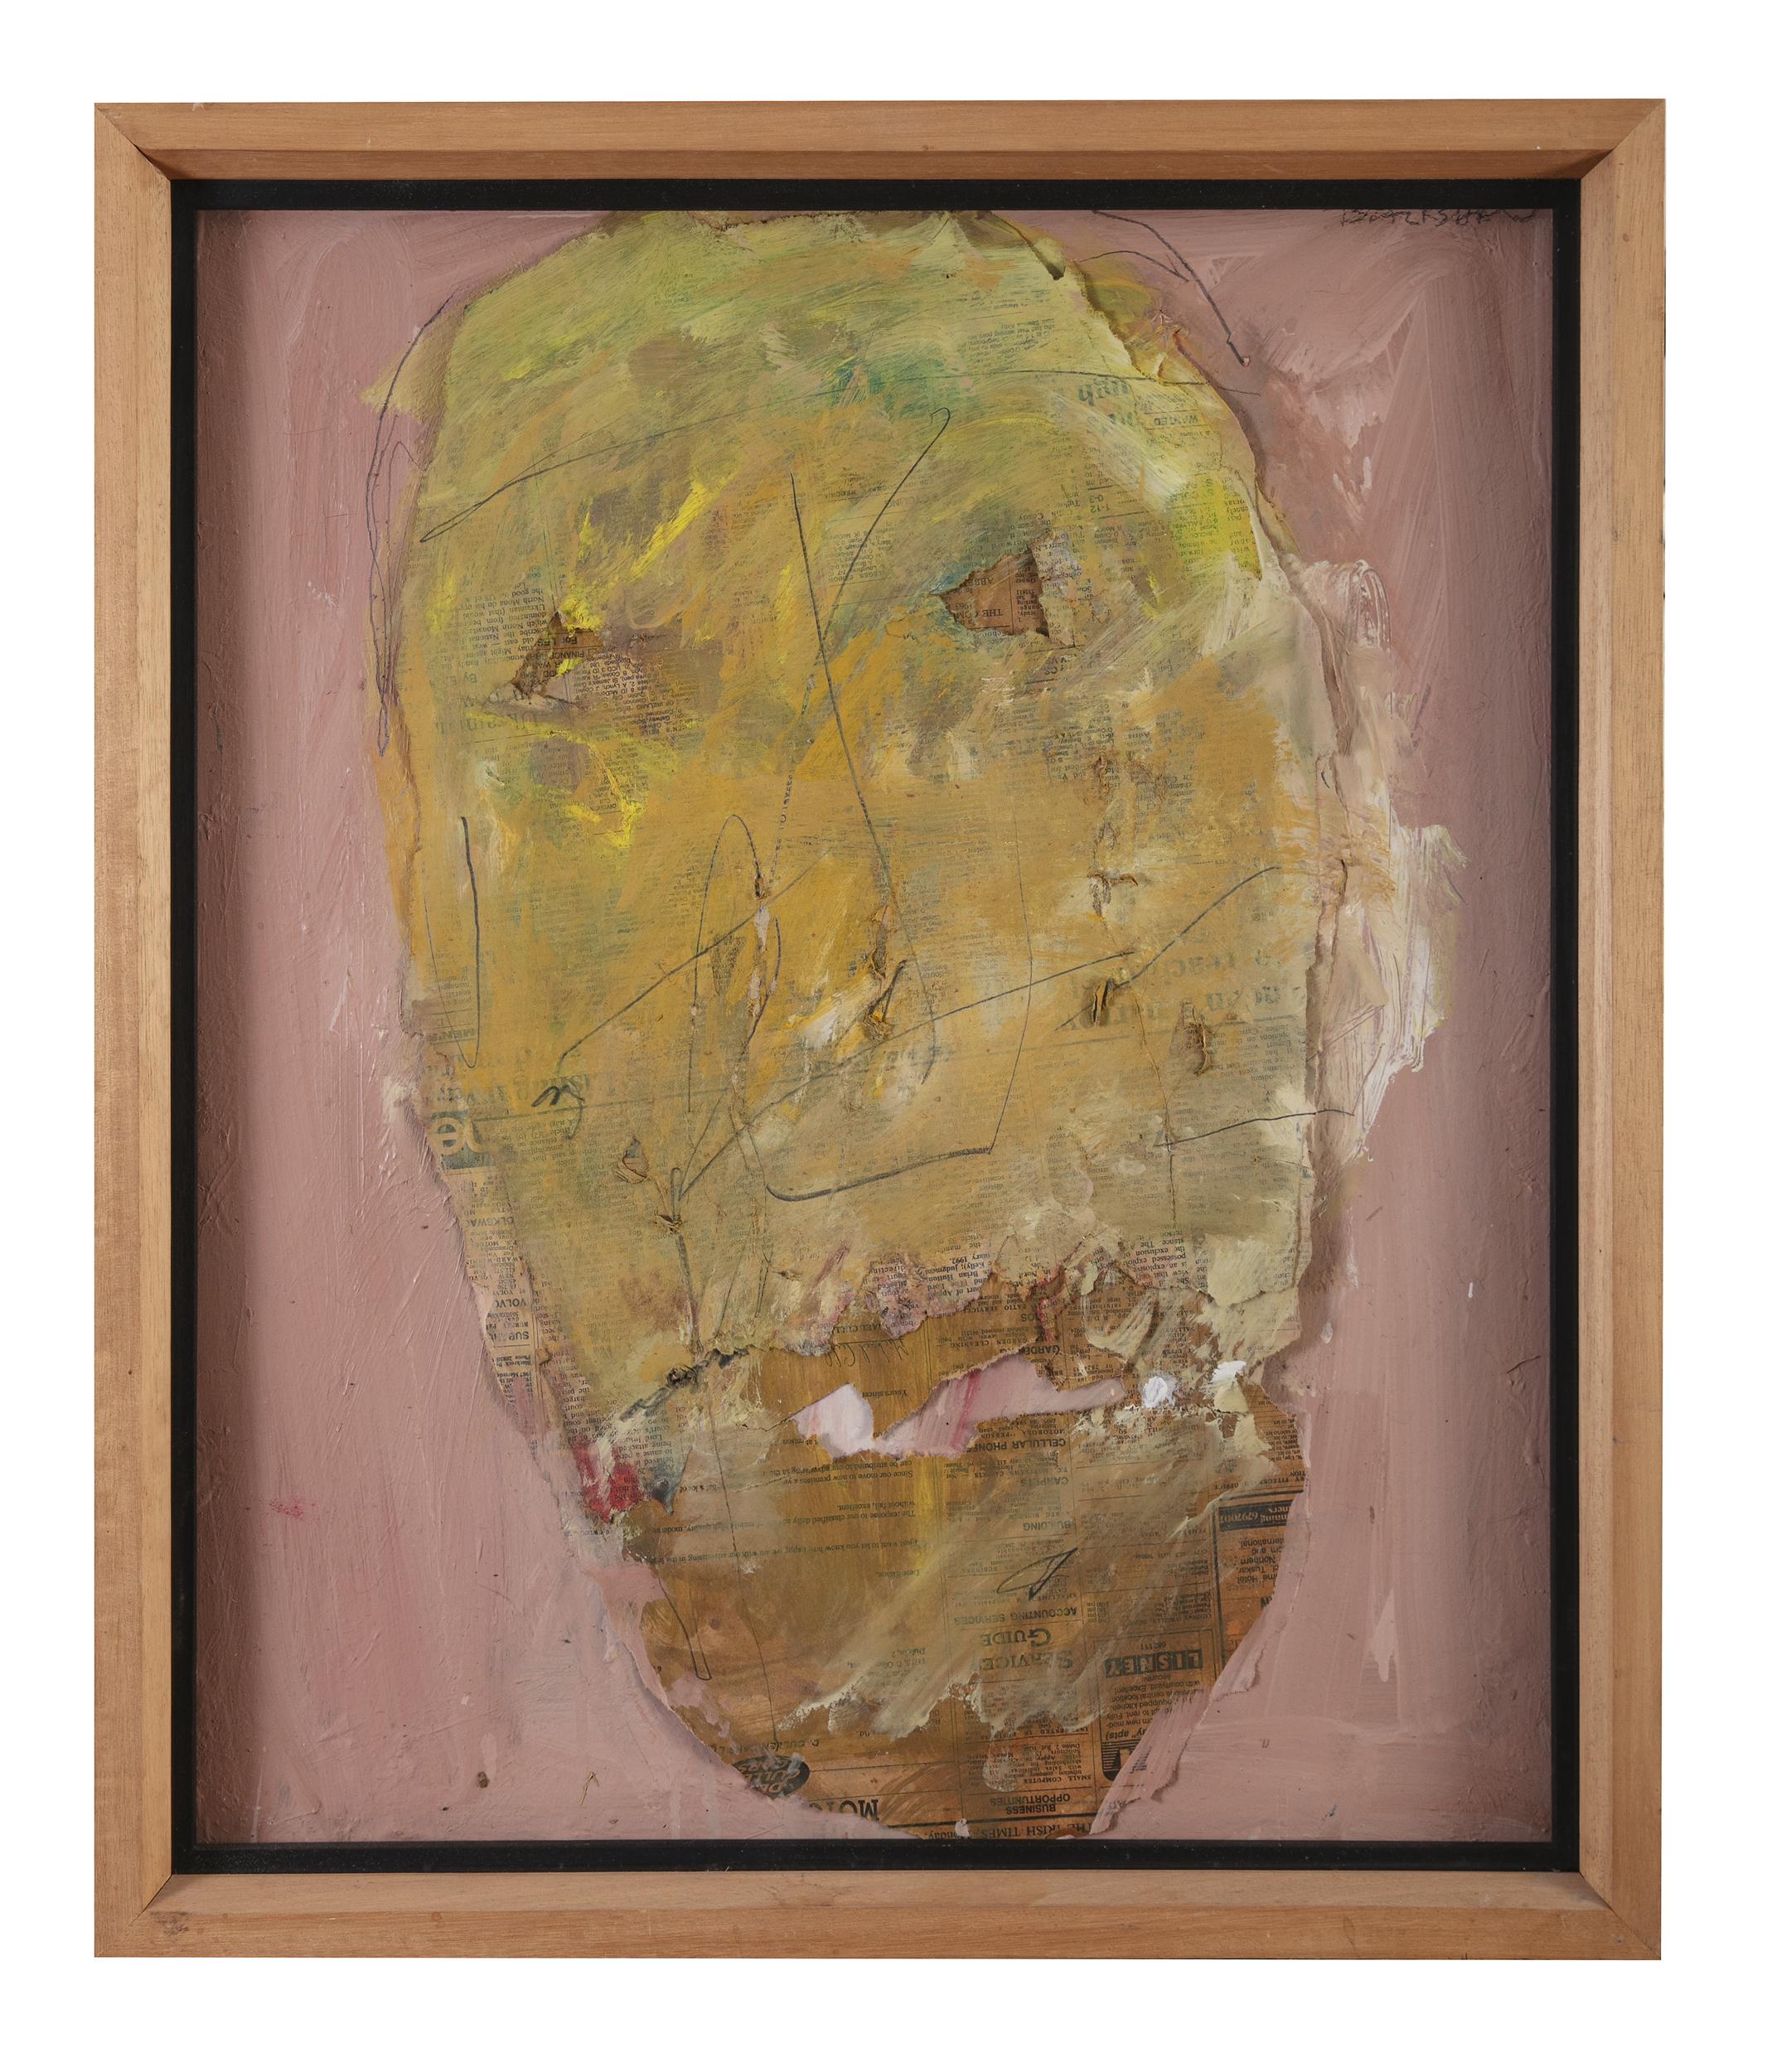 Lot 82 - Basil Blackshaw HRHA RUA (1932-2016)Head for HeaneyMixed media collage on canvas, 57.5 x 47.5cm (22¾